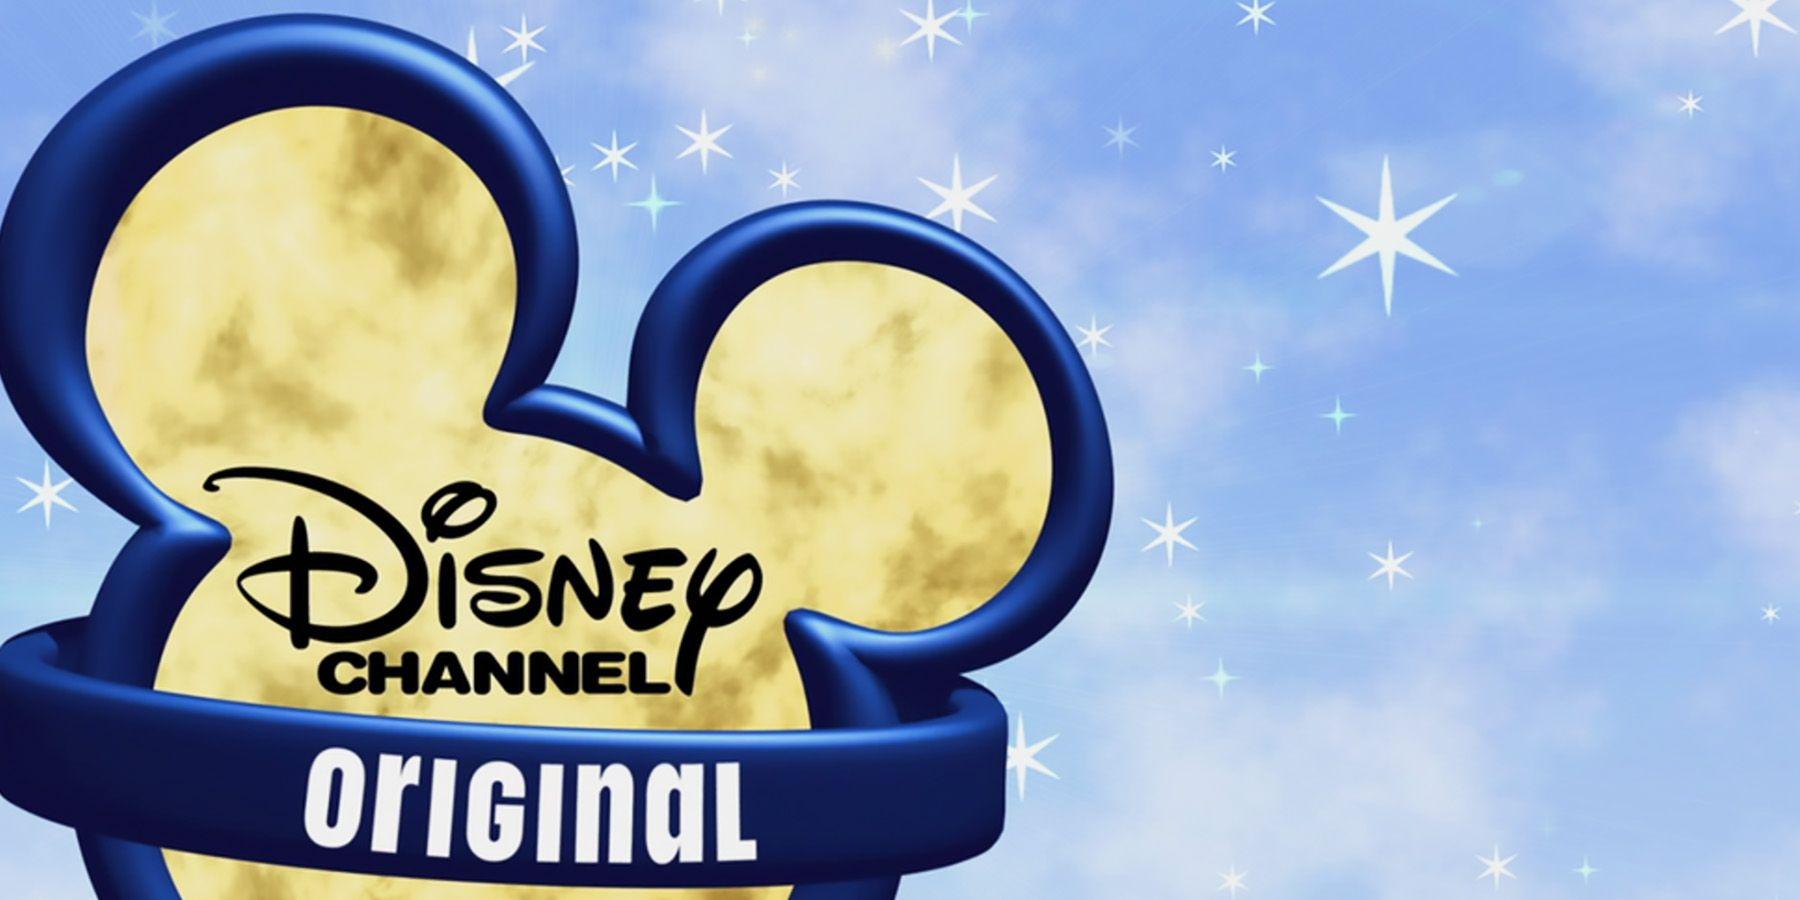 Disney Channel Original Movie - Logopedia, the logo and